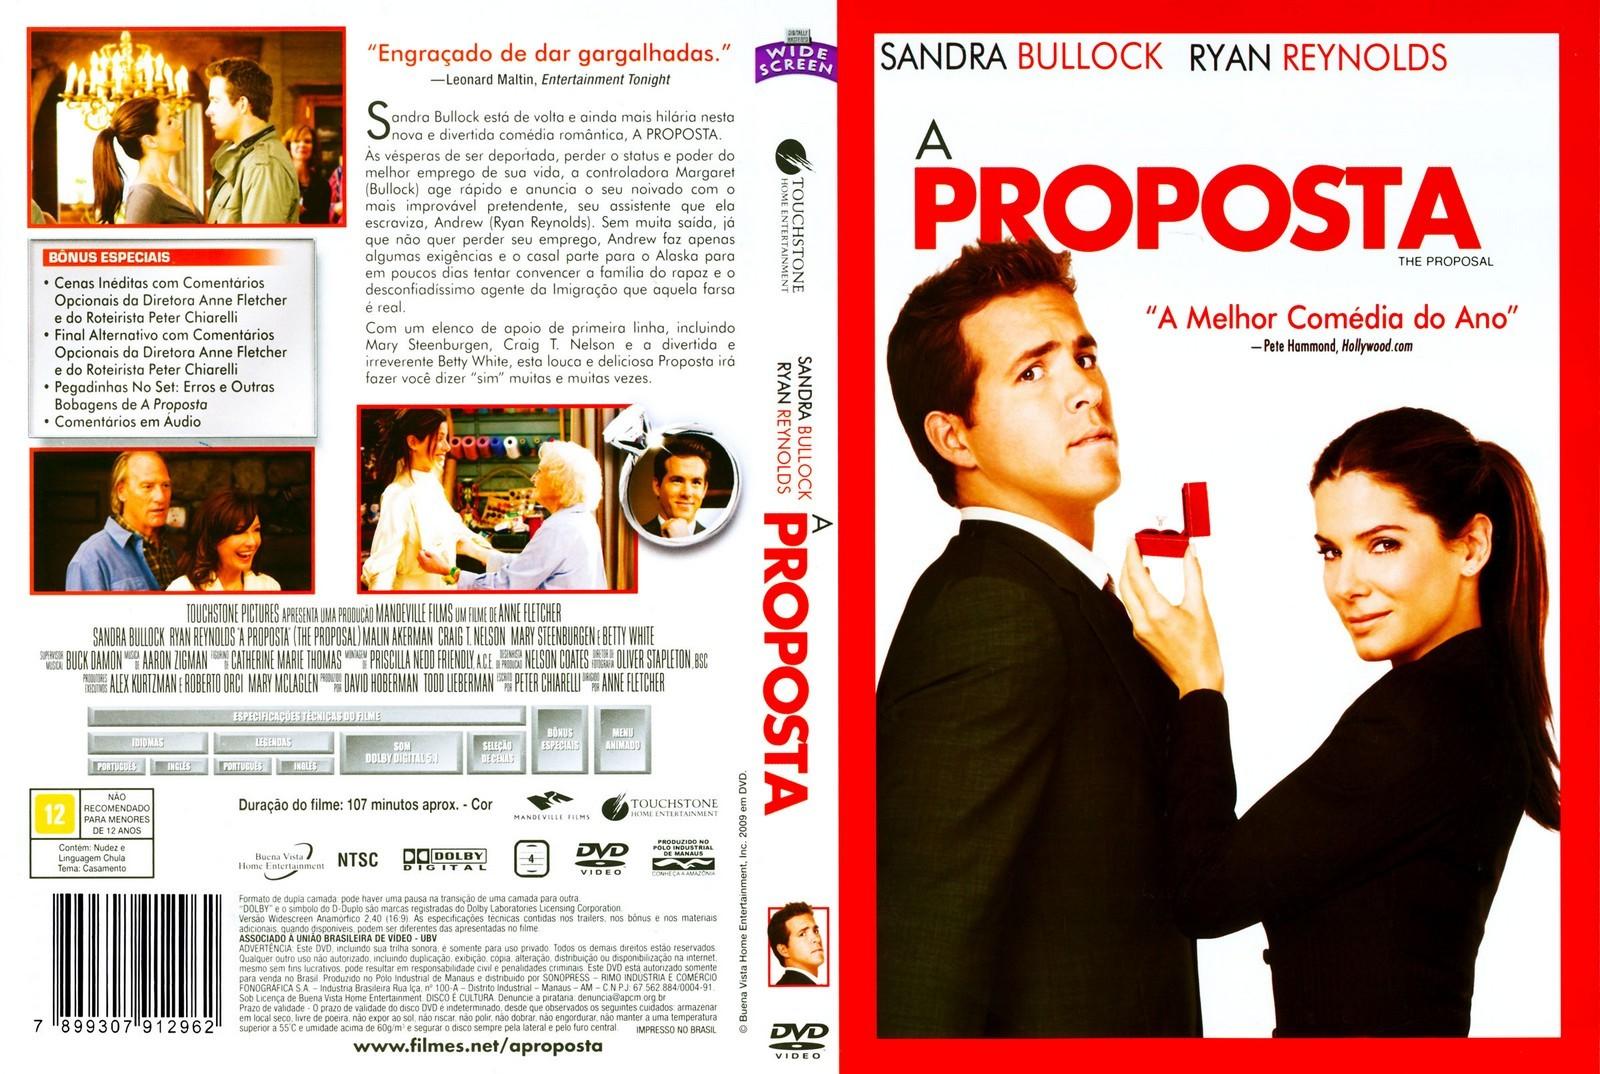 http://3.bp.blogspot.com/_SQ-LfIy-Msc/TOlrQVEjlKI/AAAAAAAAAHo/5oQzPGnIX34/s1600/A+Proposta+%2528outro+filme%2529.jpg